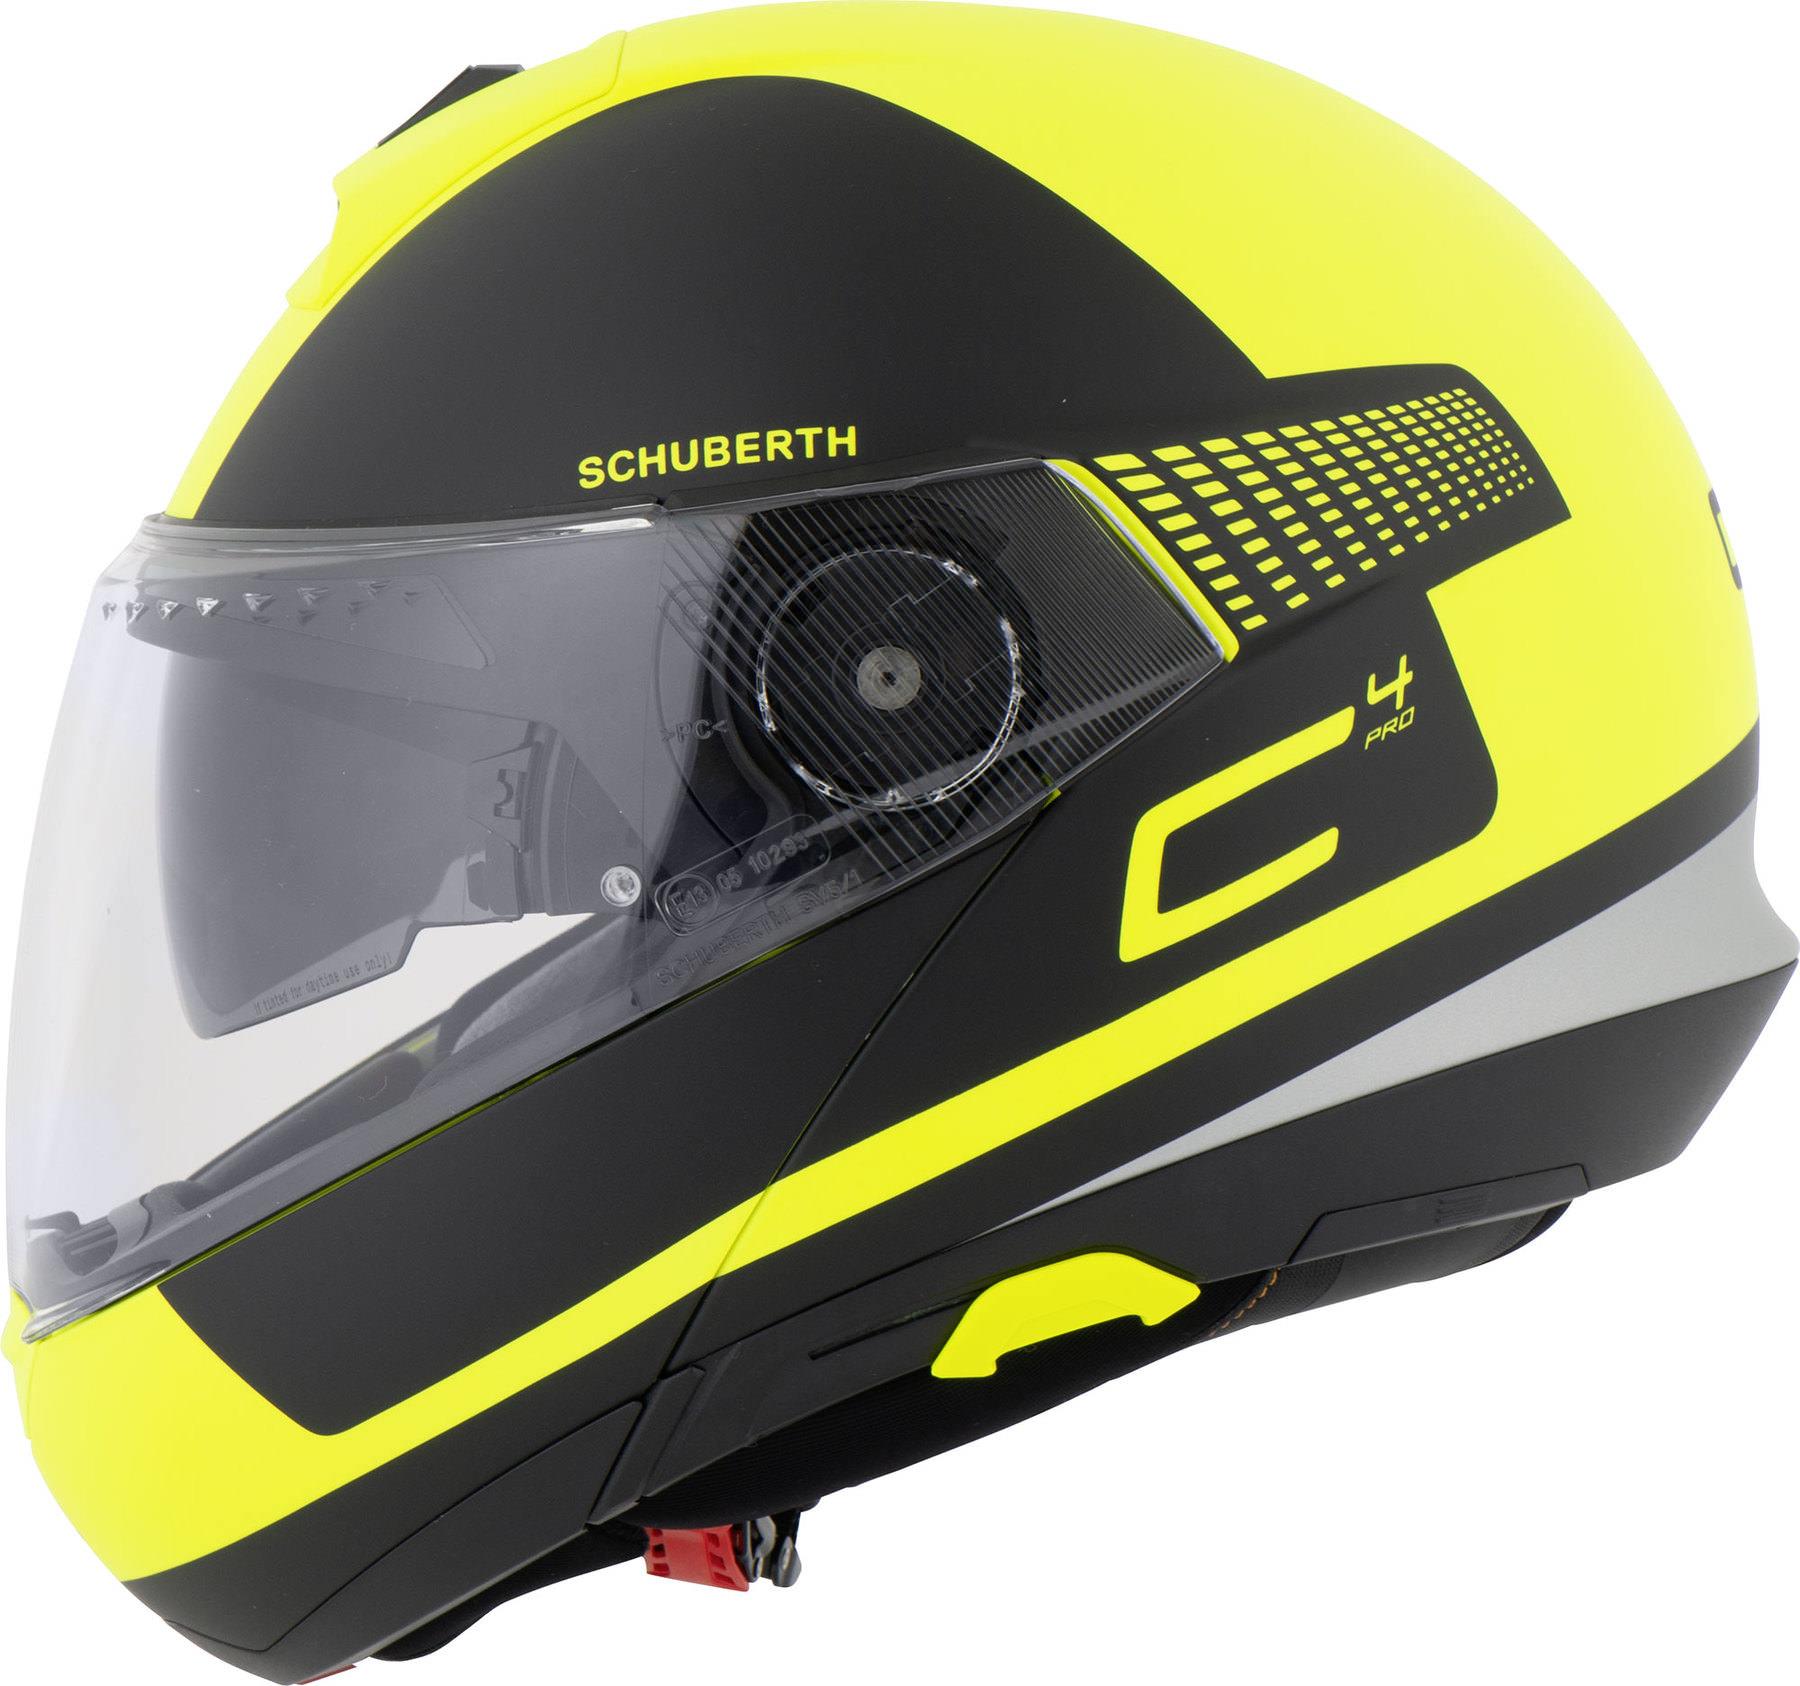 SCHUBERTH C4 PRO LEGACY Motorrad Helm Farbe: matt/schwarz gelb